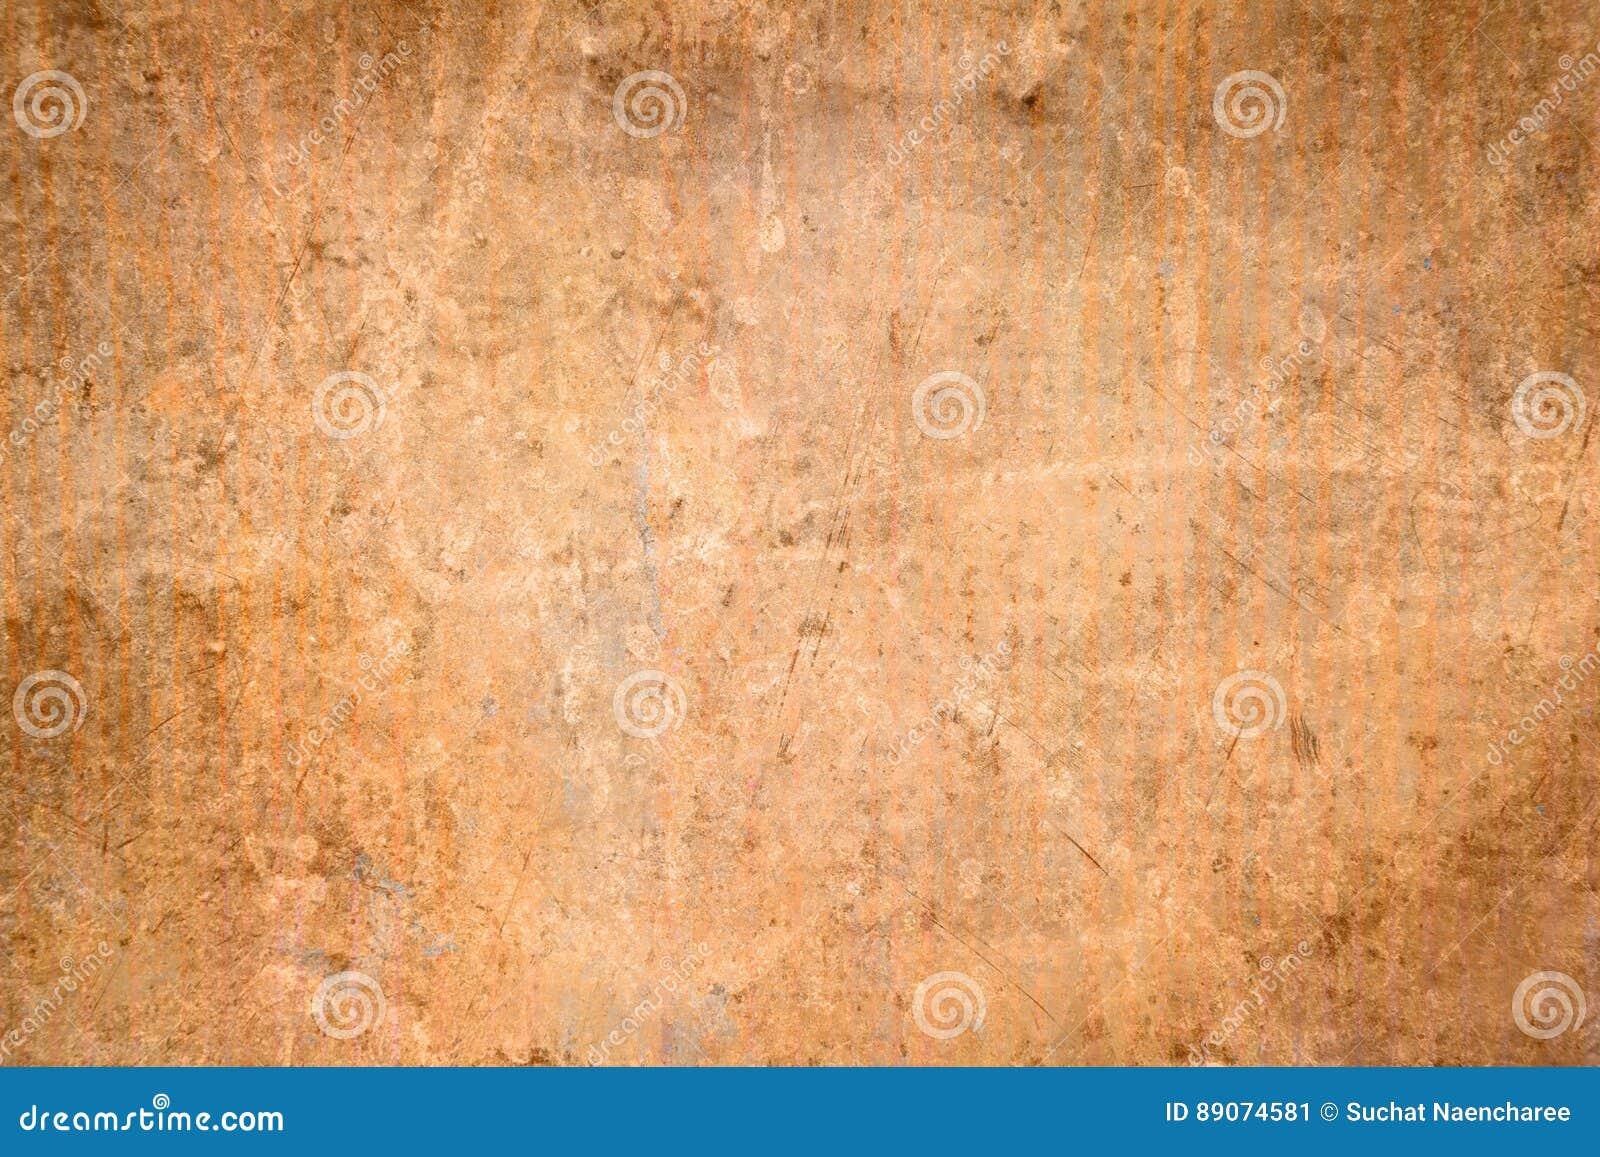 Grunge Rustic Copper Texture